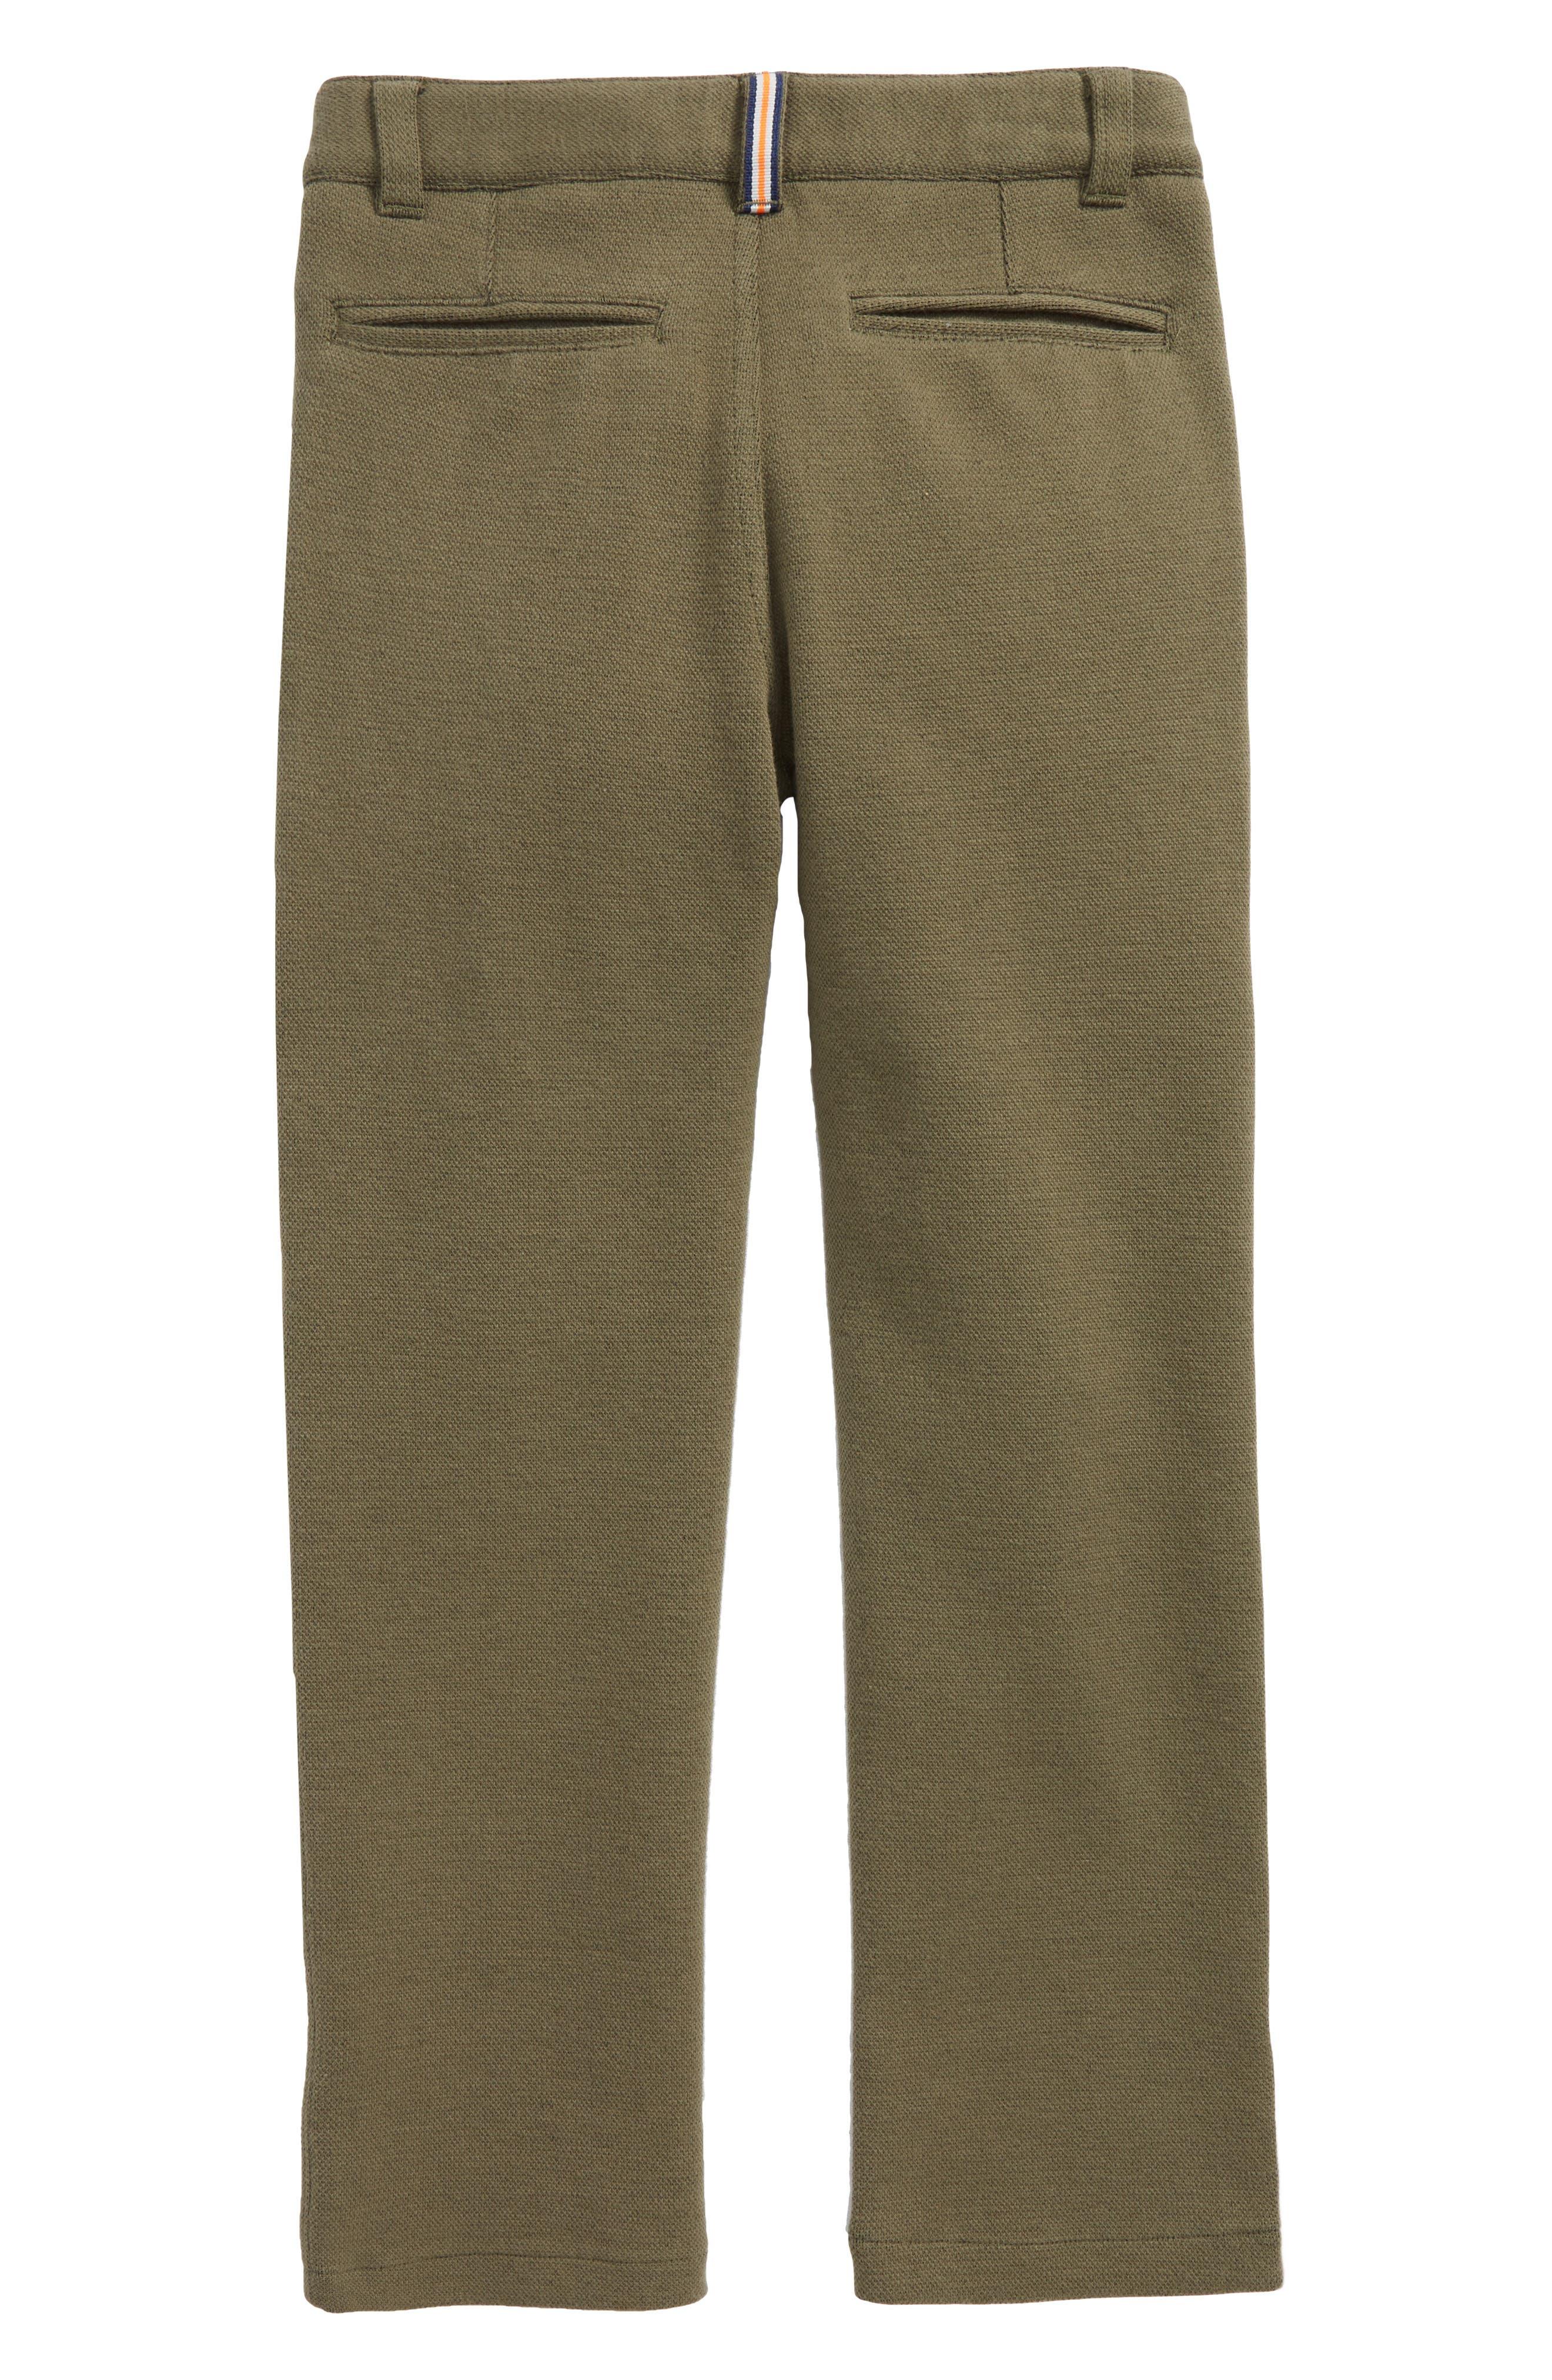 Jersey Chino Pants,                             Alternate thumbnail 2, color,                             304